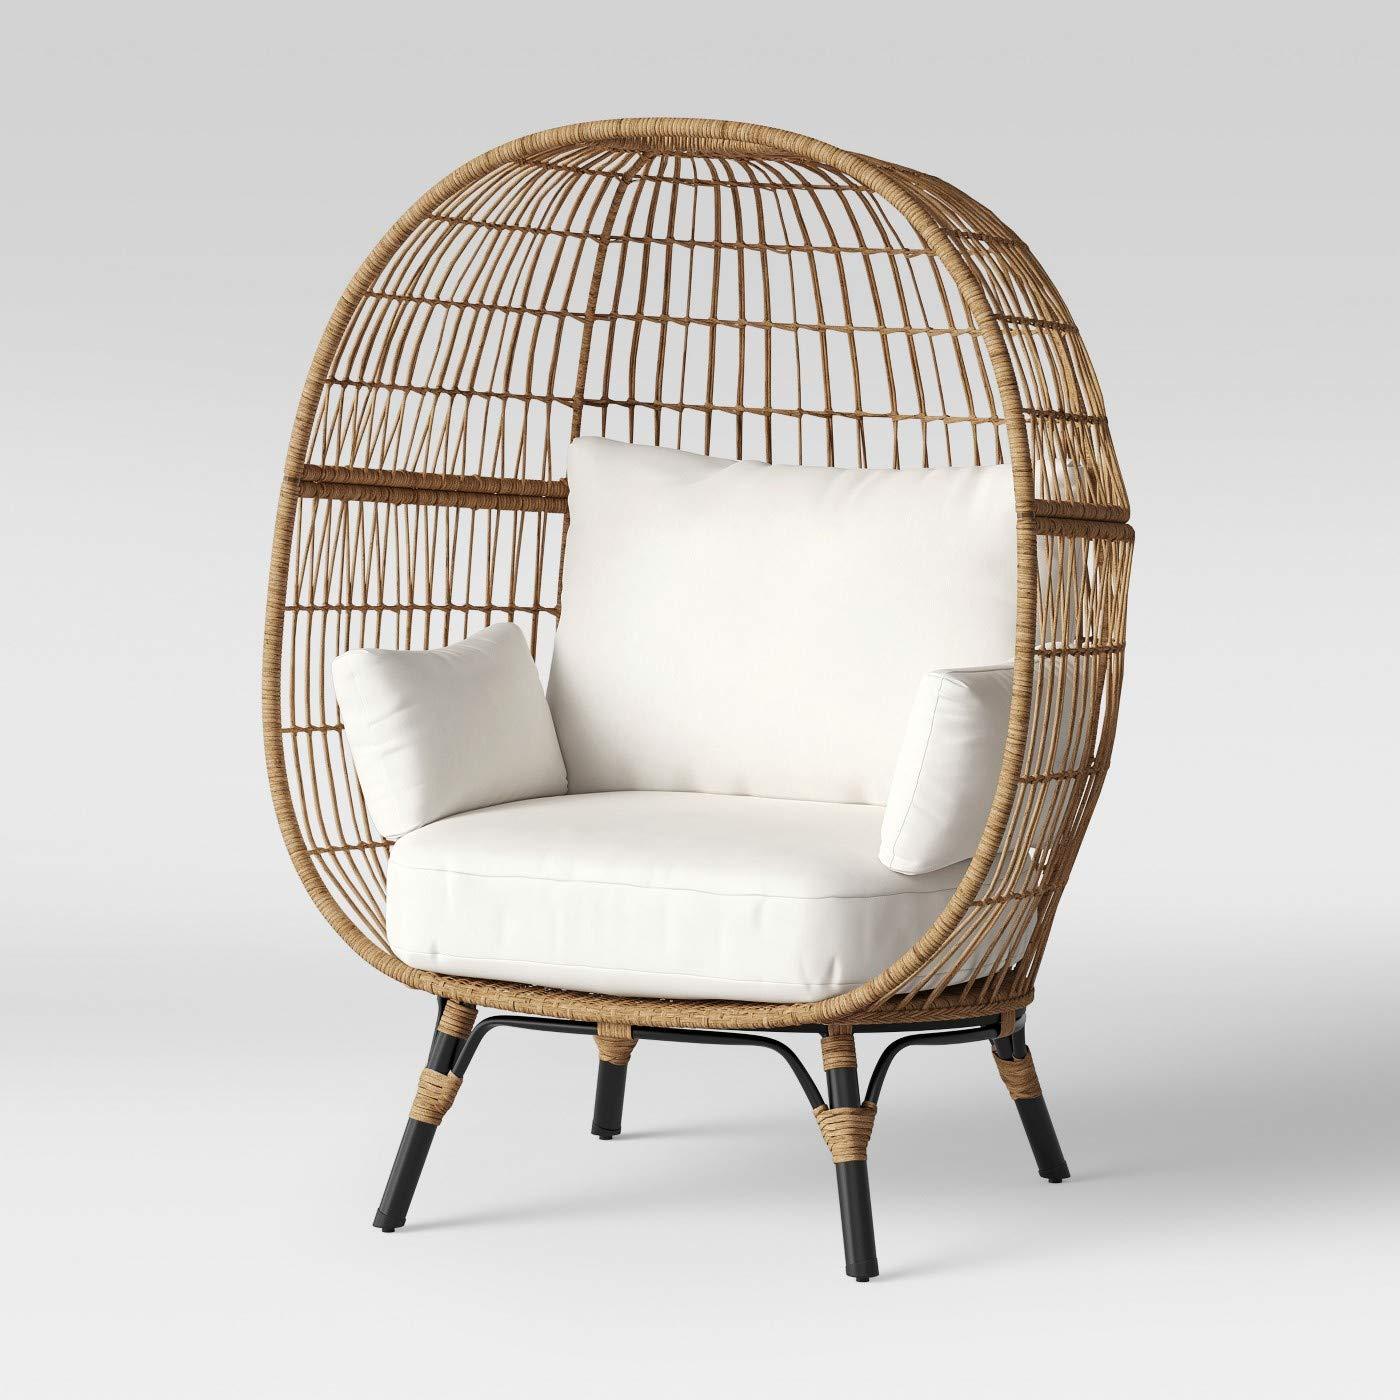 Fine Amazon Com Opalhouse Southport Patio Egg Chair Linen Inzonedesignstudio Interior Chair Design Inzonedesignstudiocom